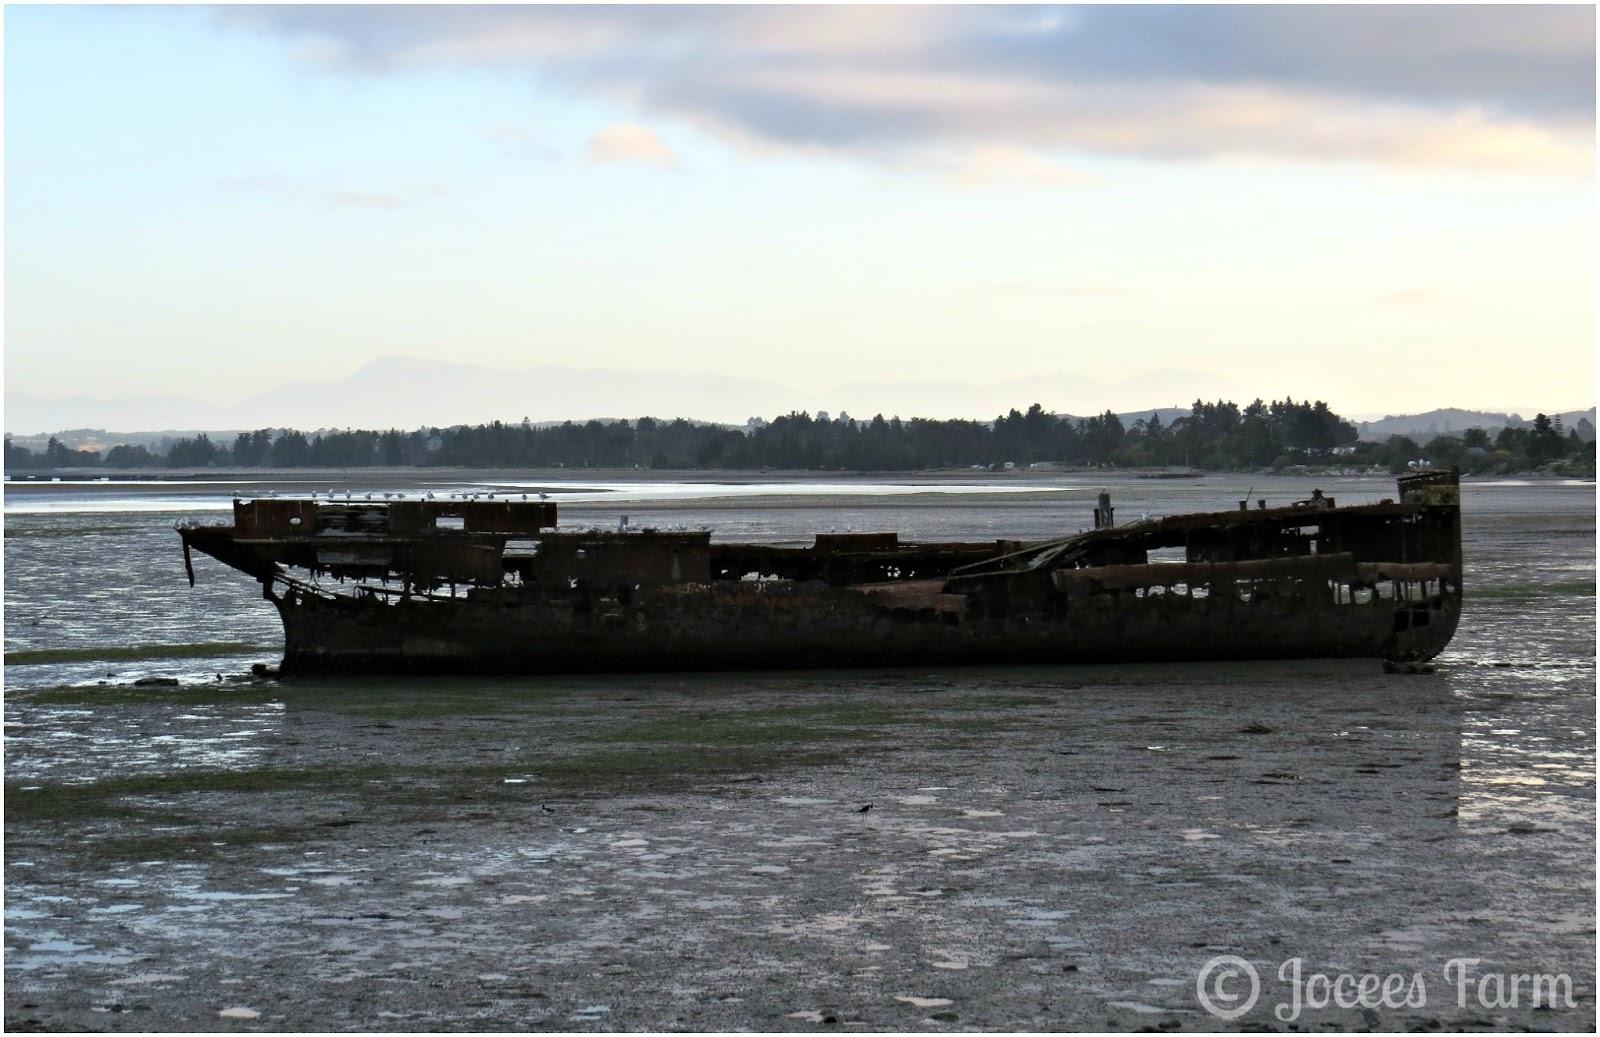 Motueka Shipwreck  http://joceesfarm.blogspot.co.nz